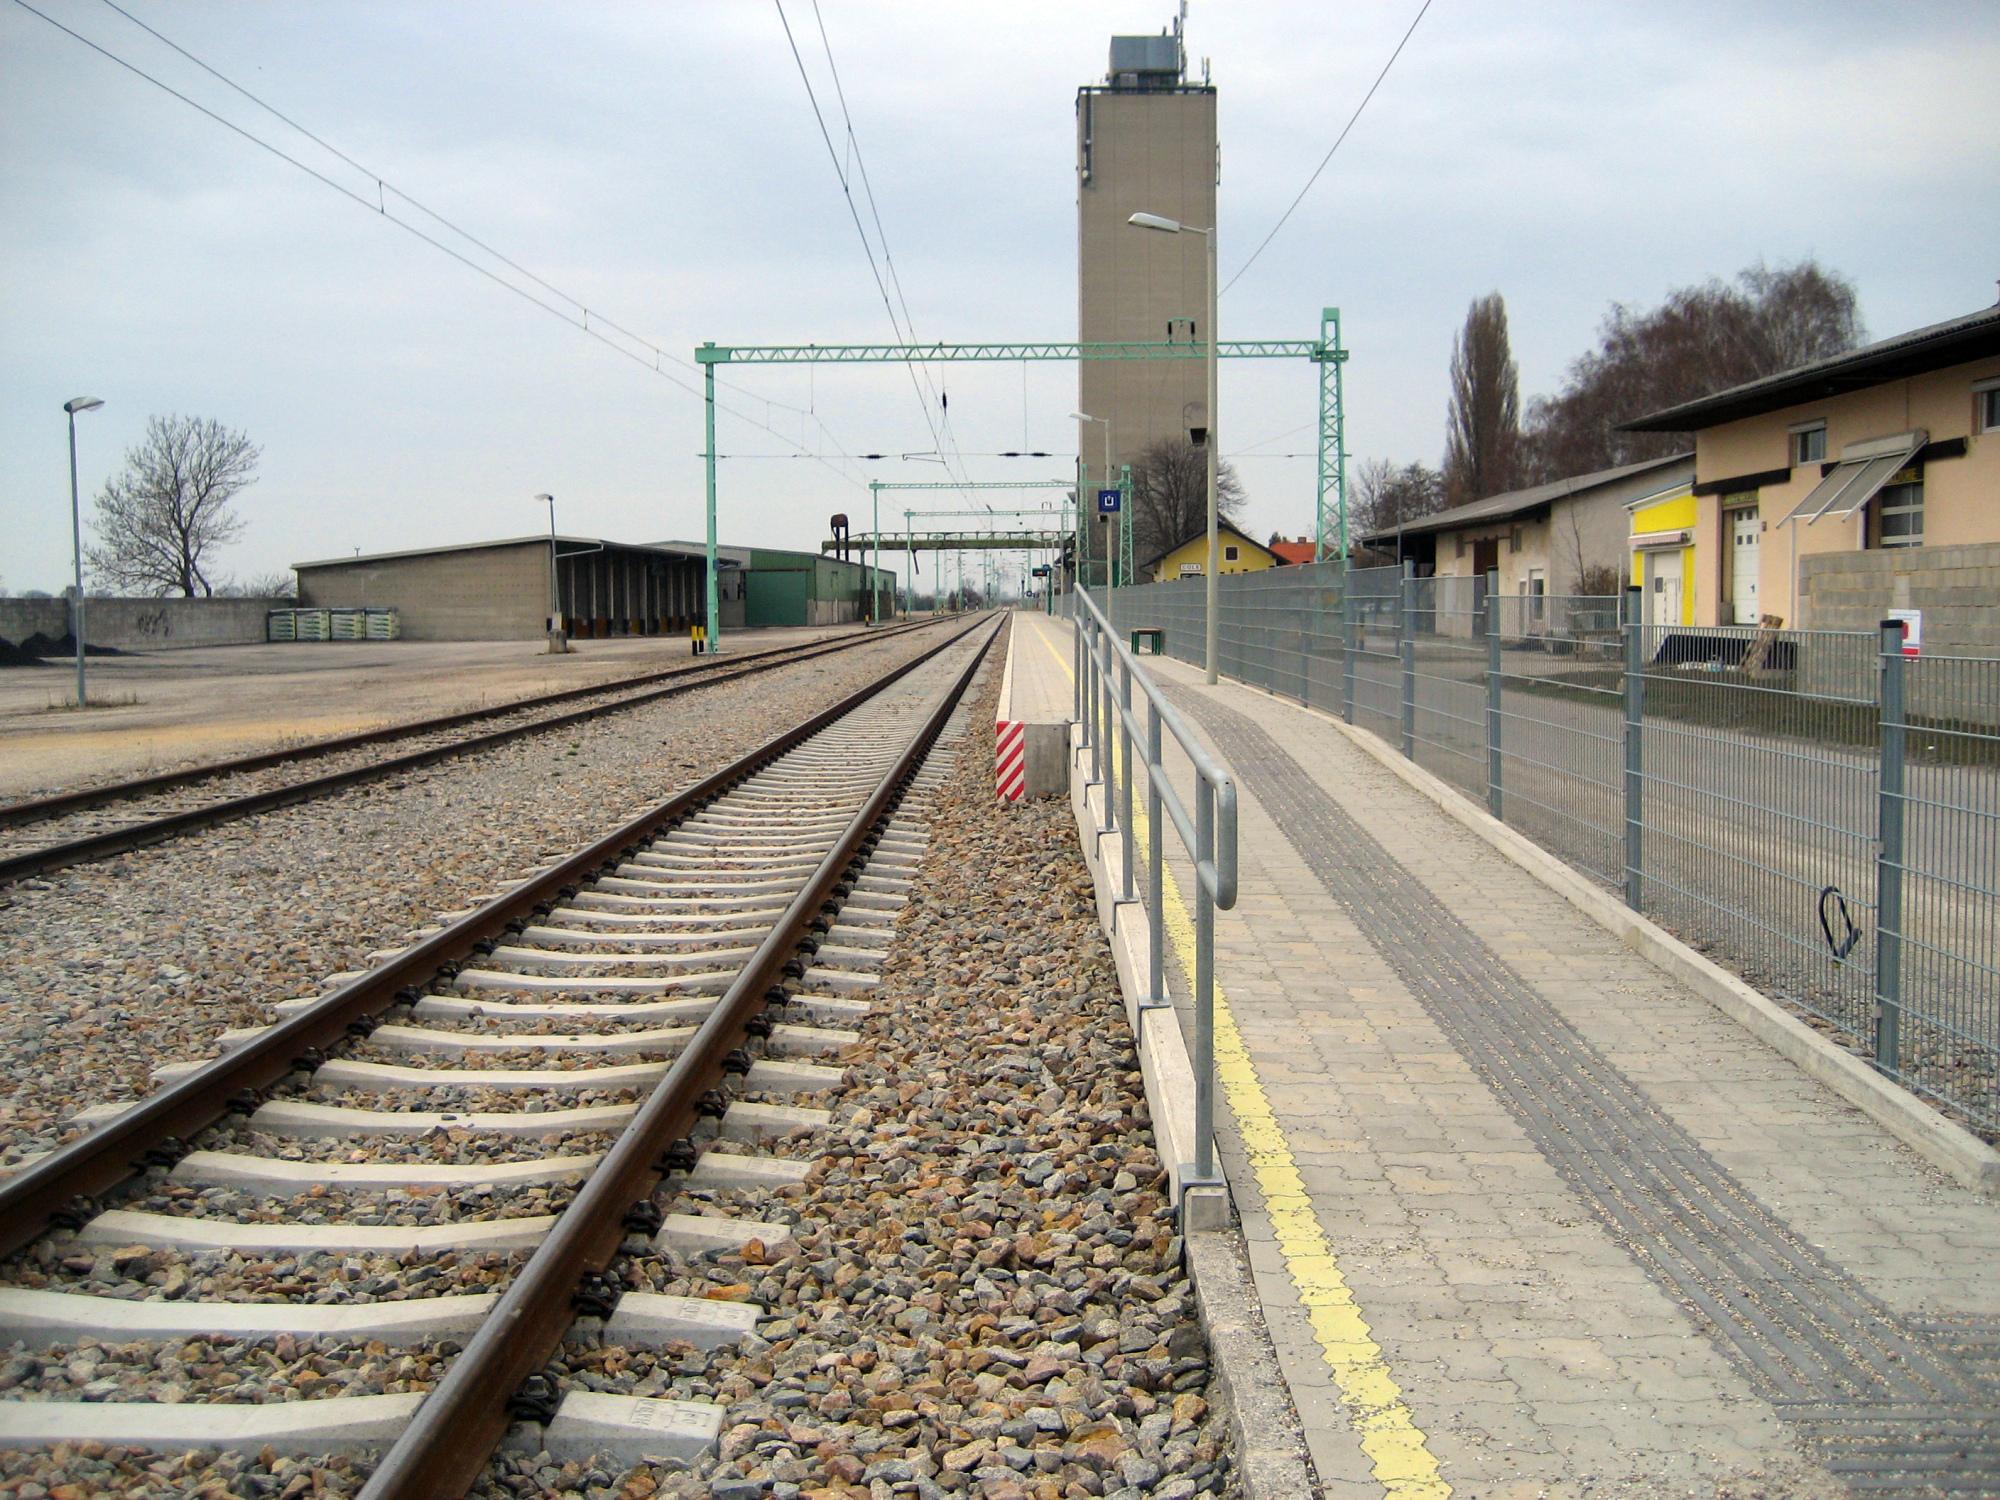 Topf suchte Deckel in Gols - Neusiedl am See - rockmartonline.com